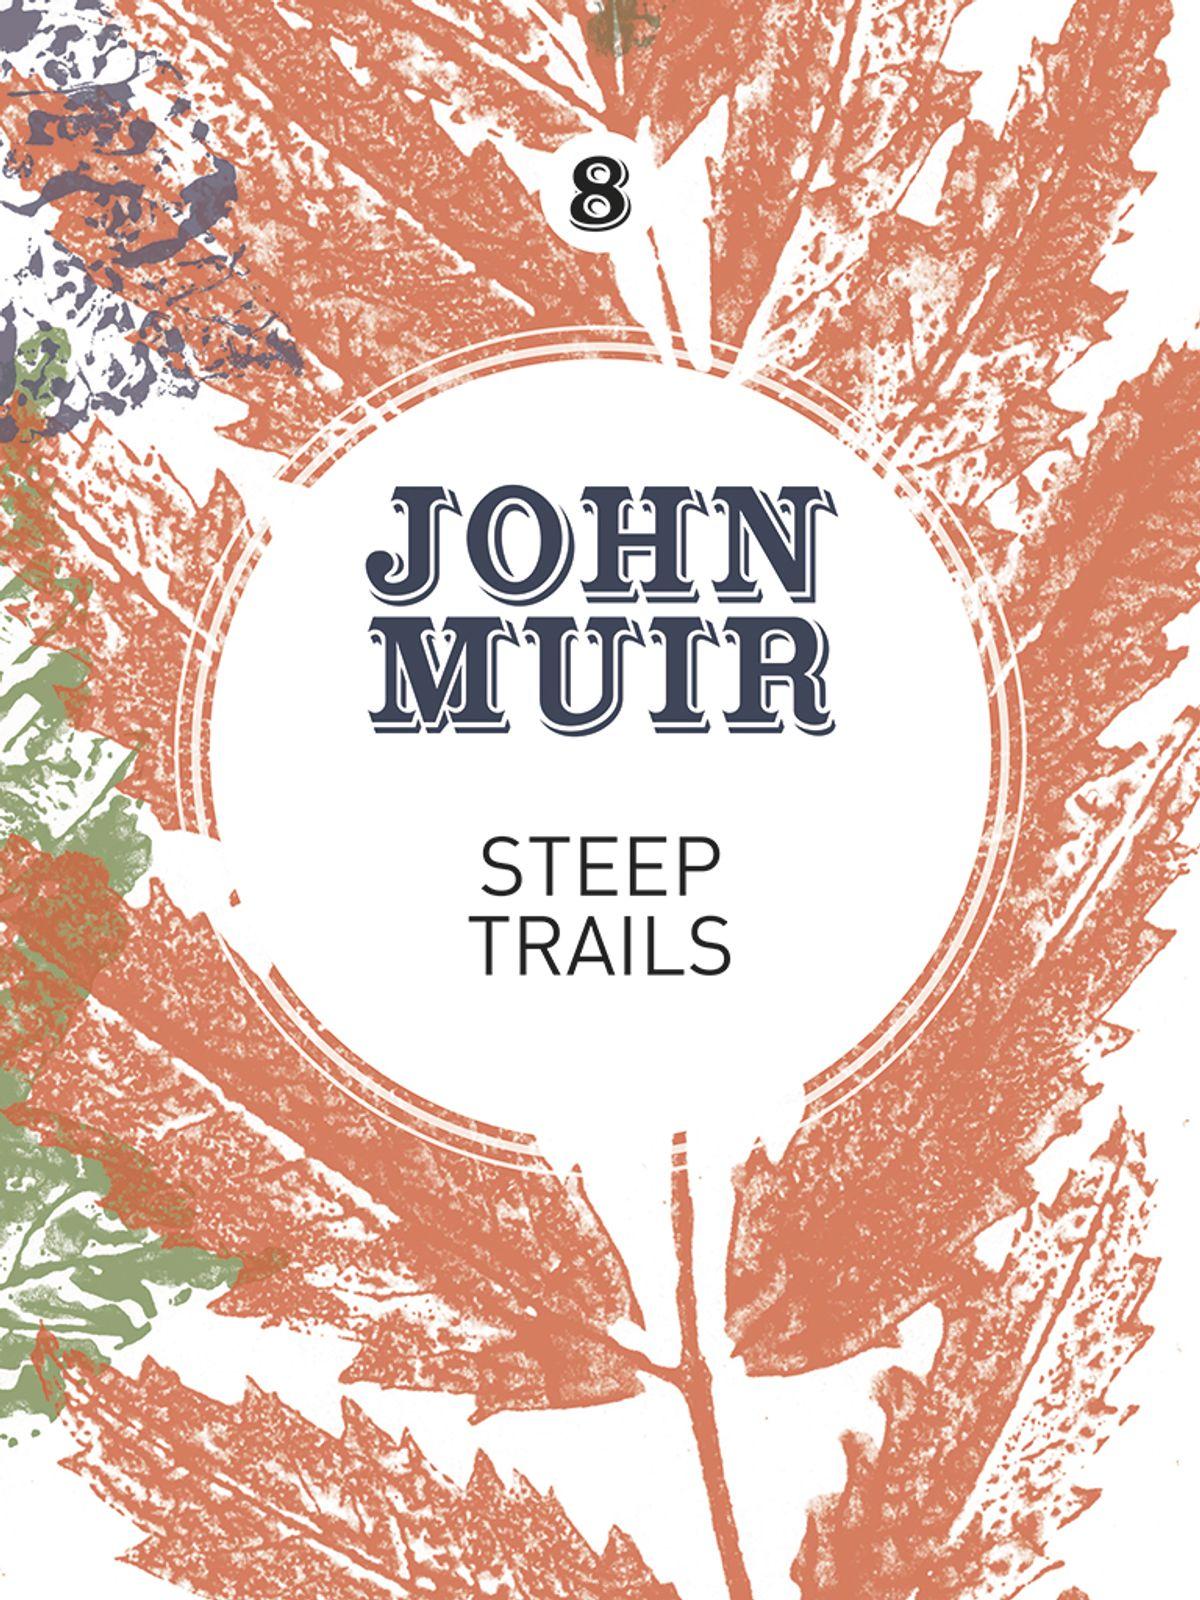 021 Essay Example John Muir Wilderness Essays Steep Trails Best Pdf Review Full